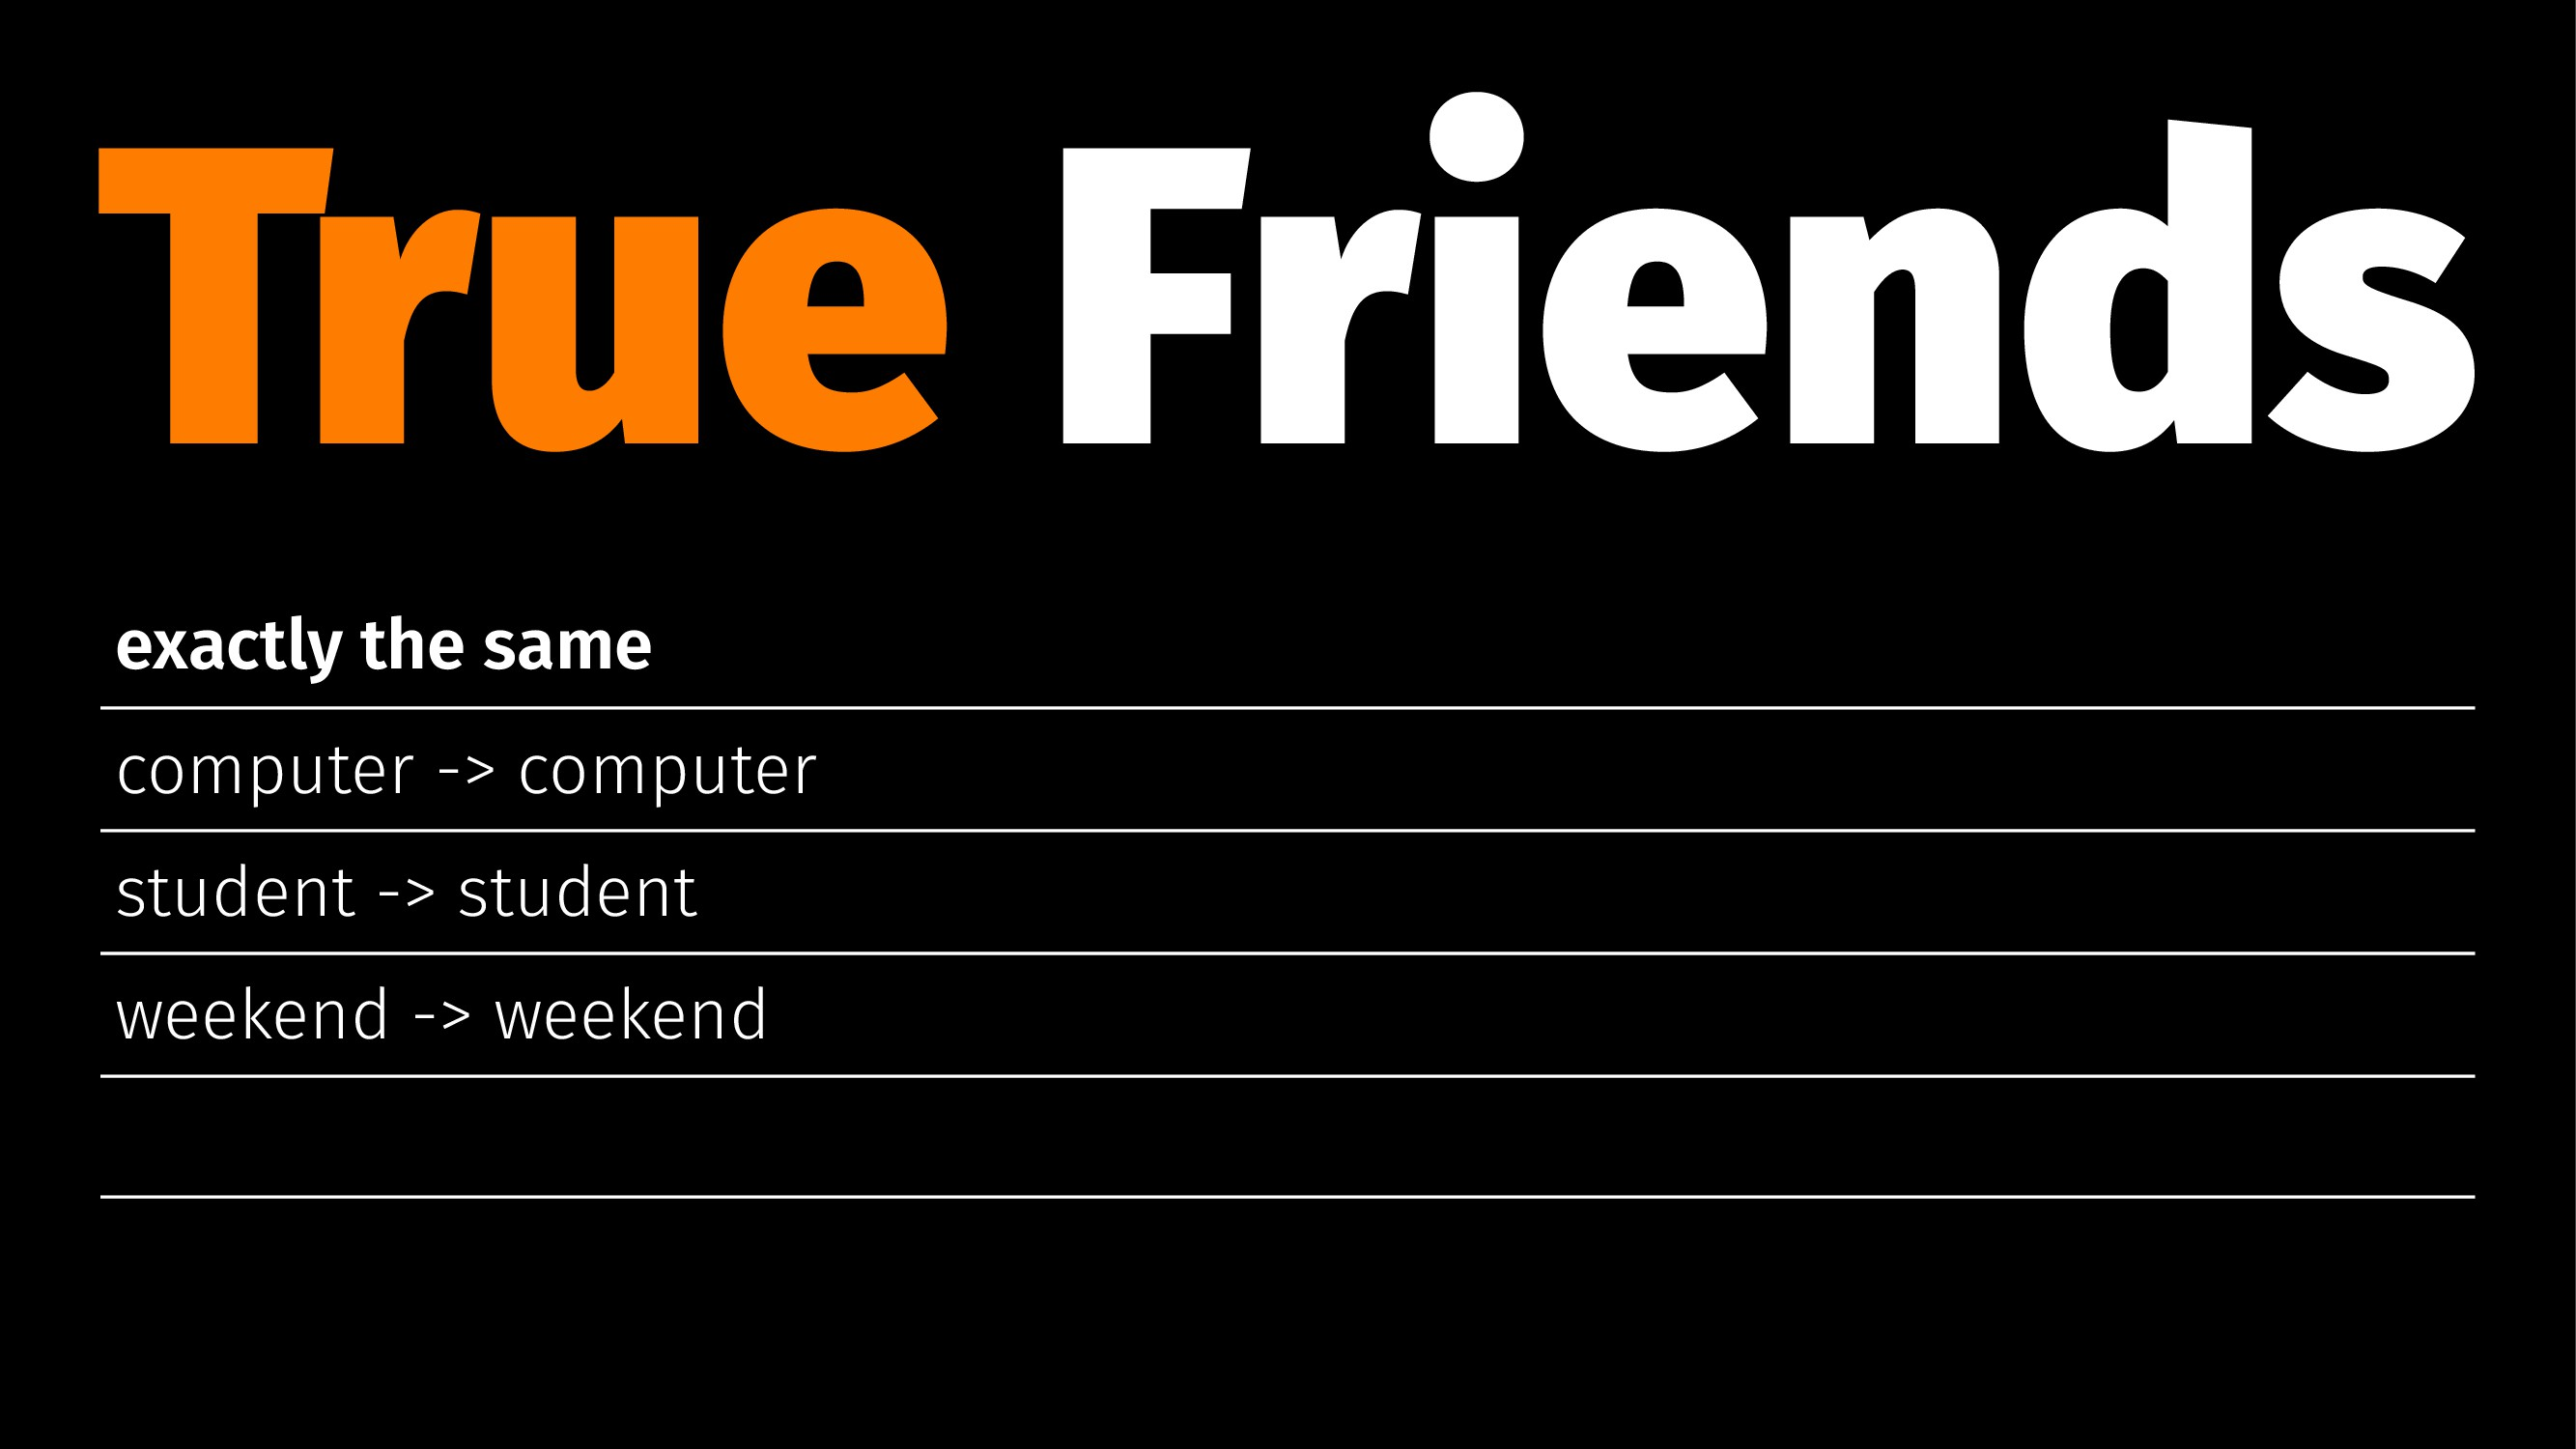 True Friends exactly the same computer -> compu...